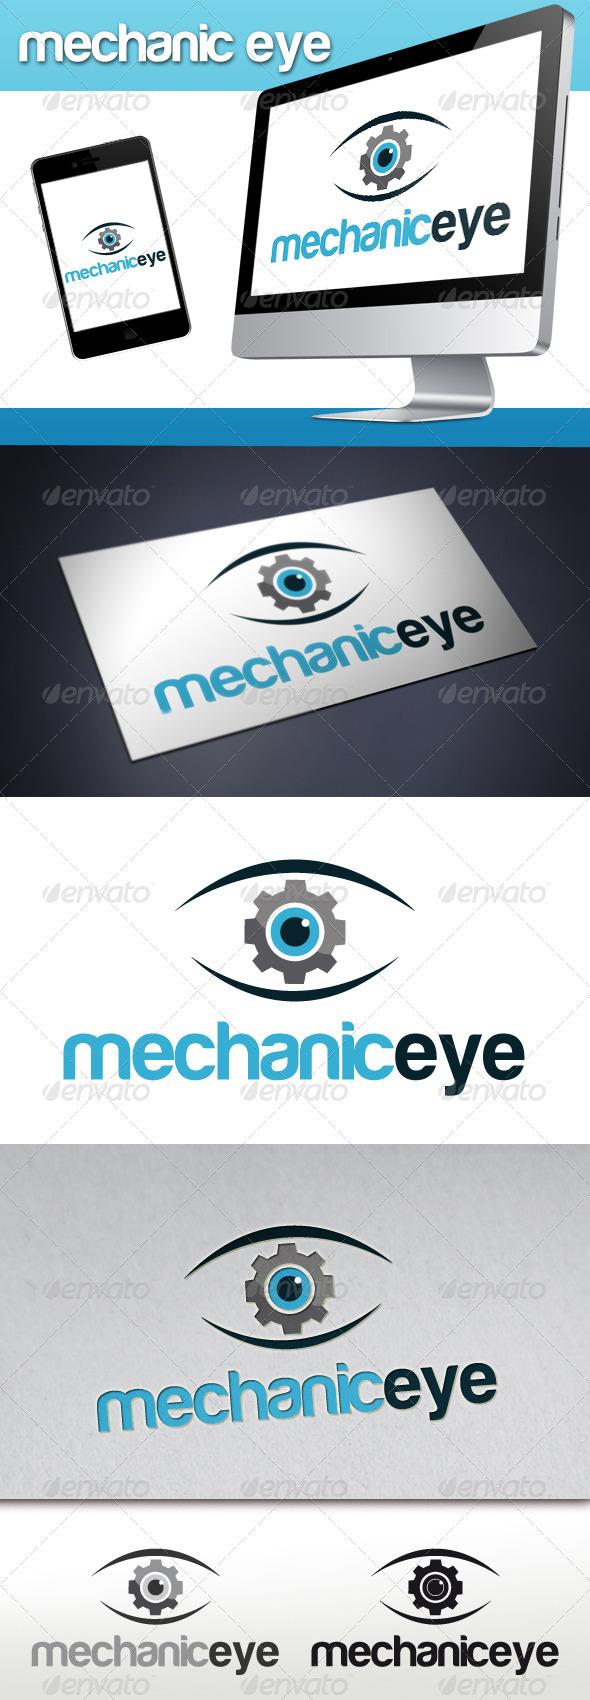 GraphicRiver Mechanic Eye Logo 3365254